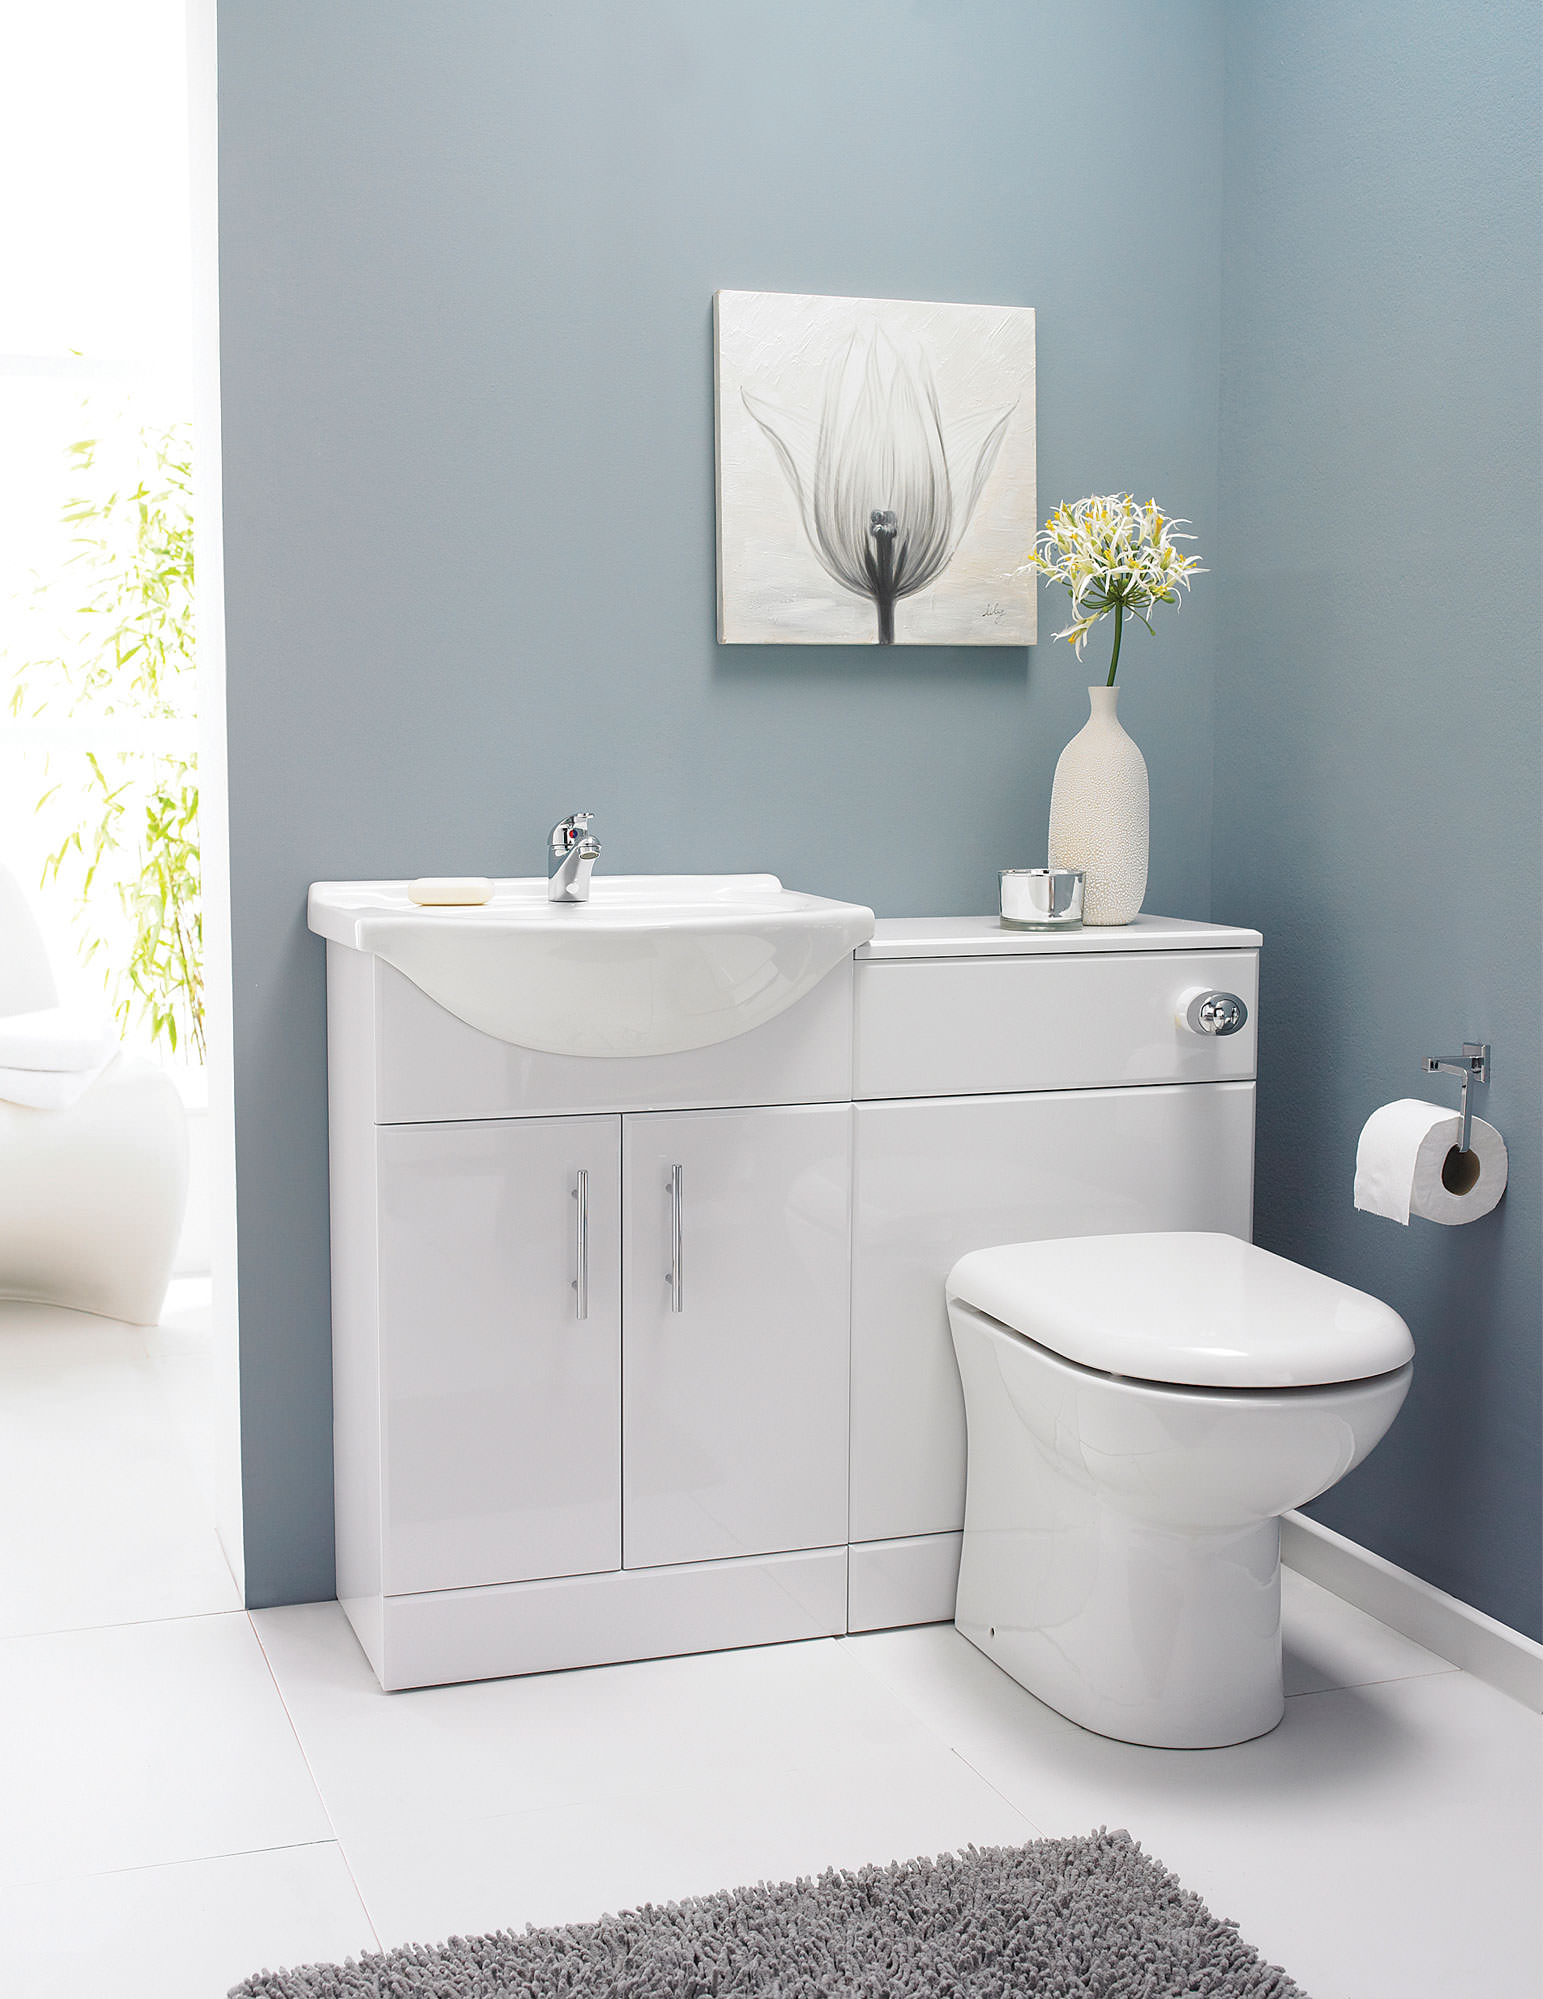 Lauren Saturn Bathroom Furniture Pack